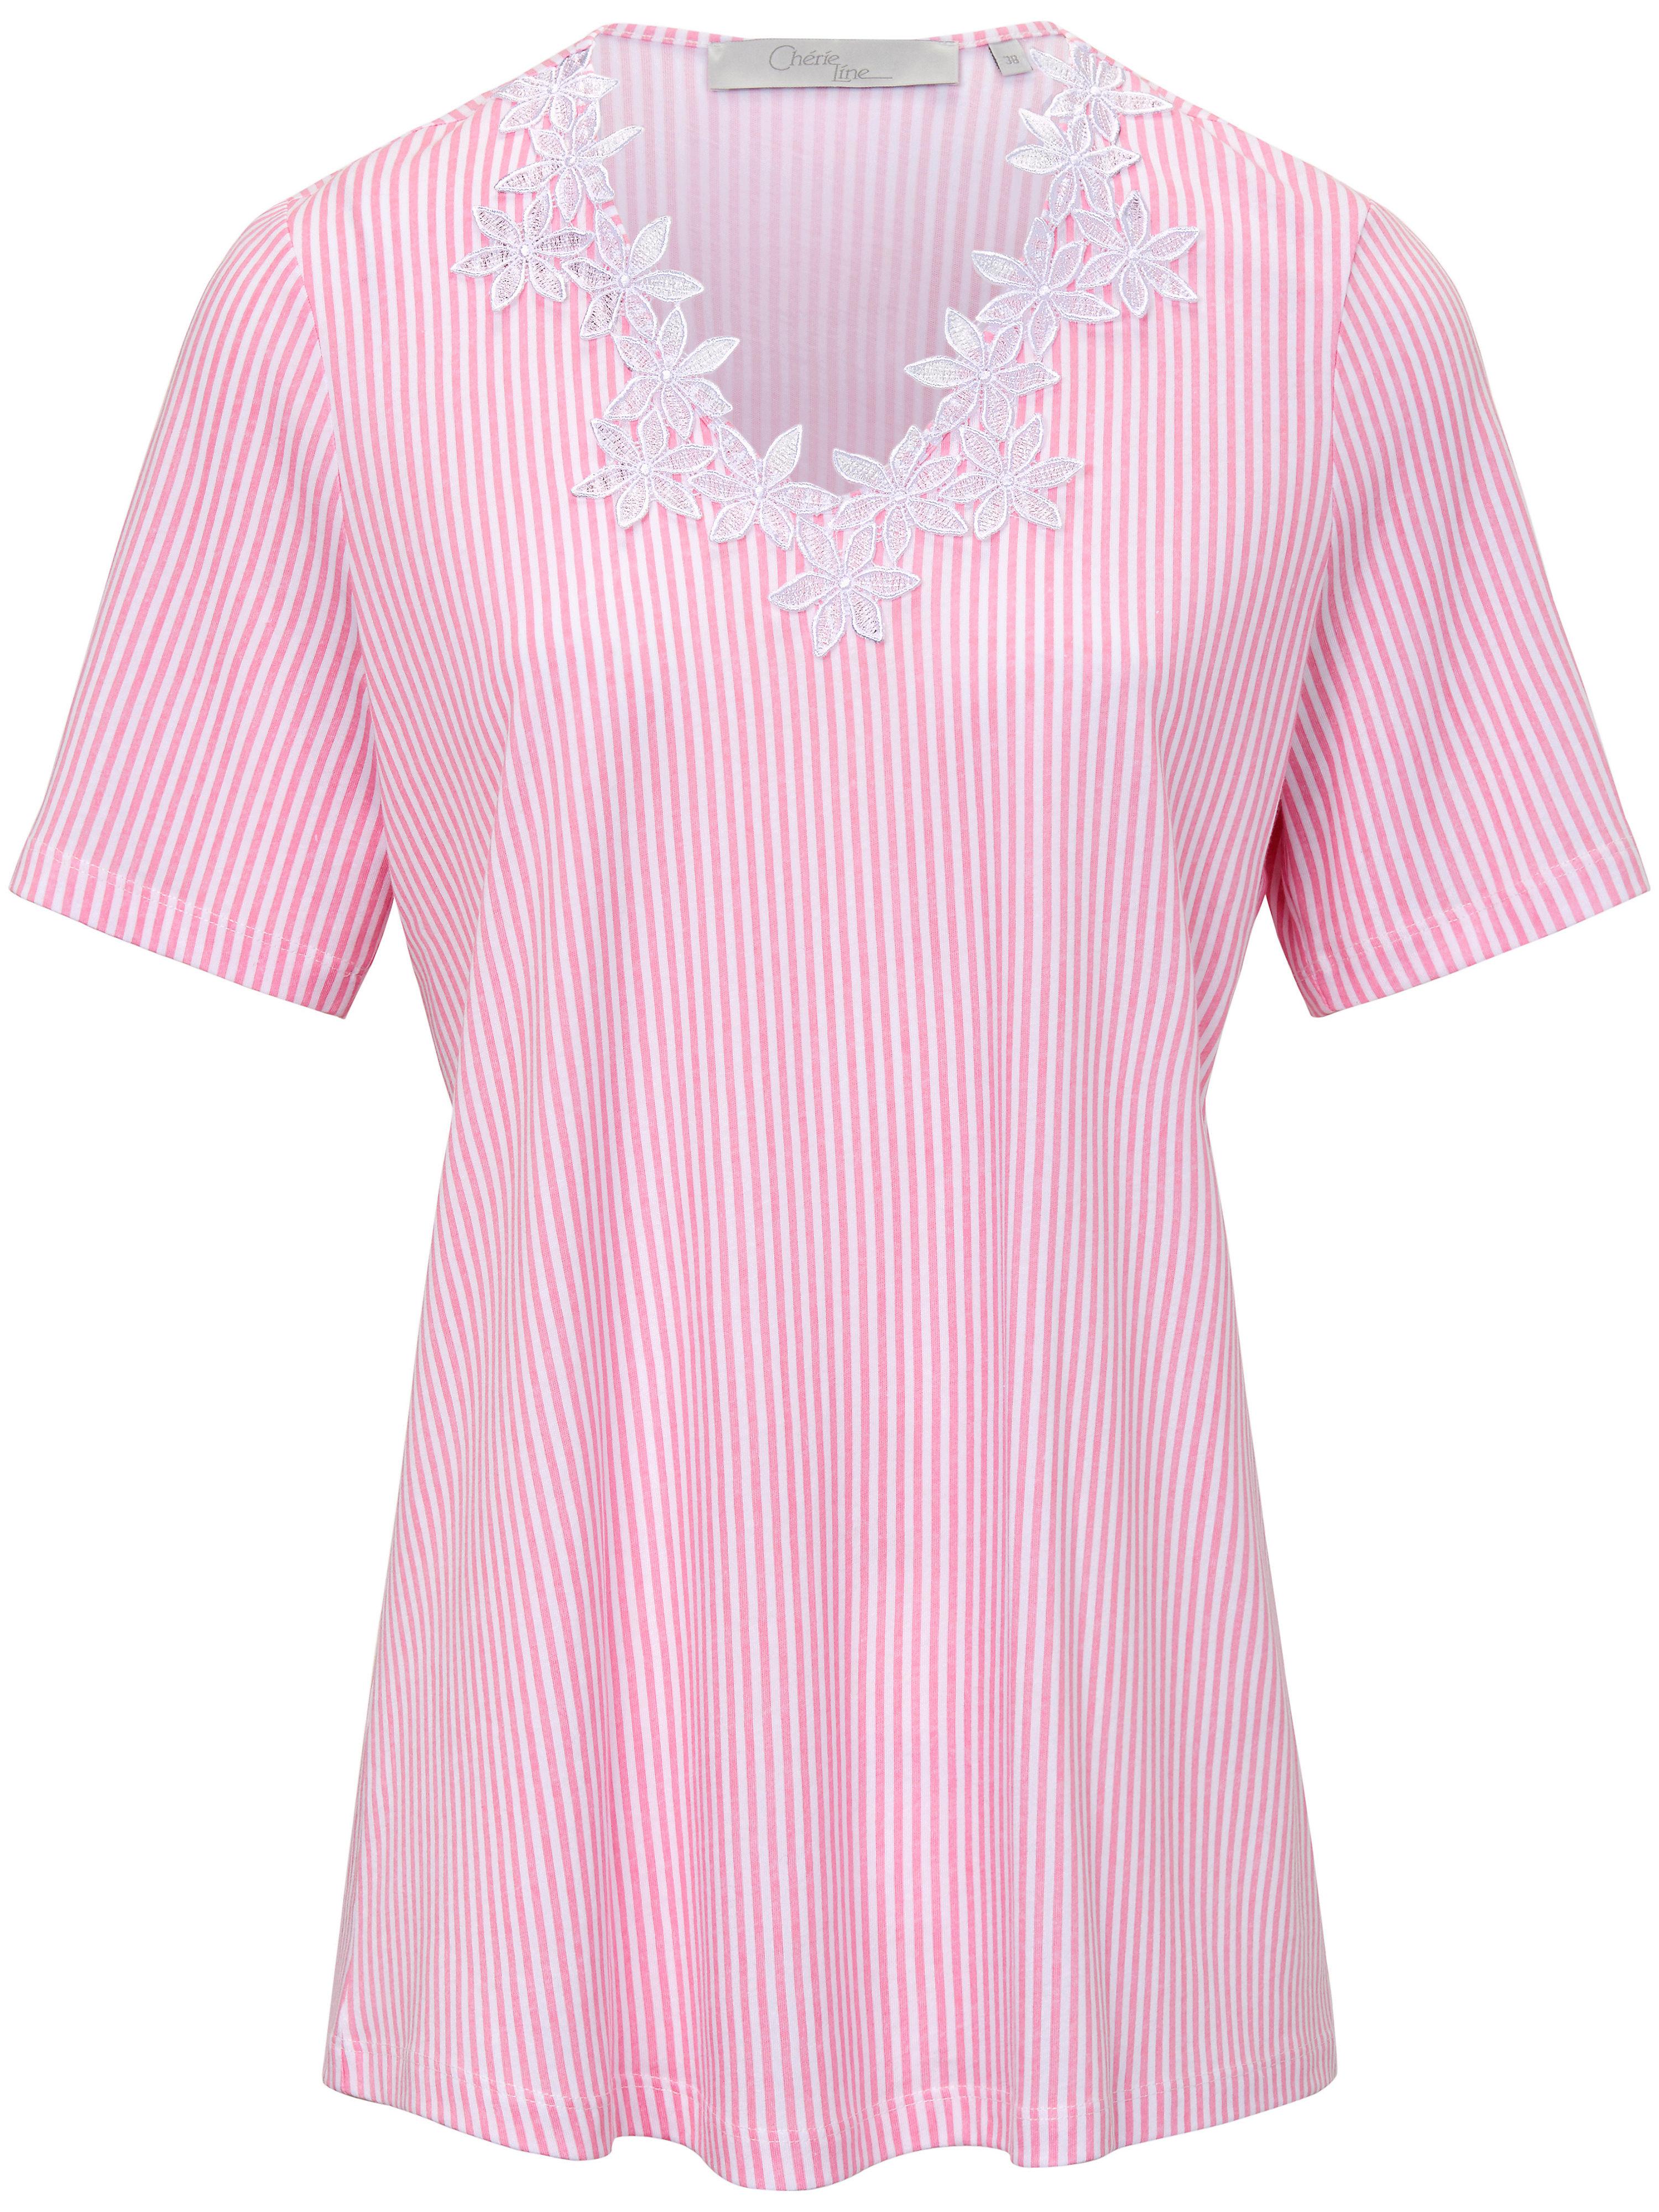 Le pyjama  Cherie Line multicolore